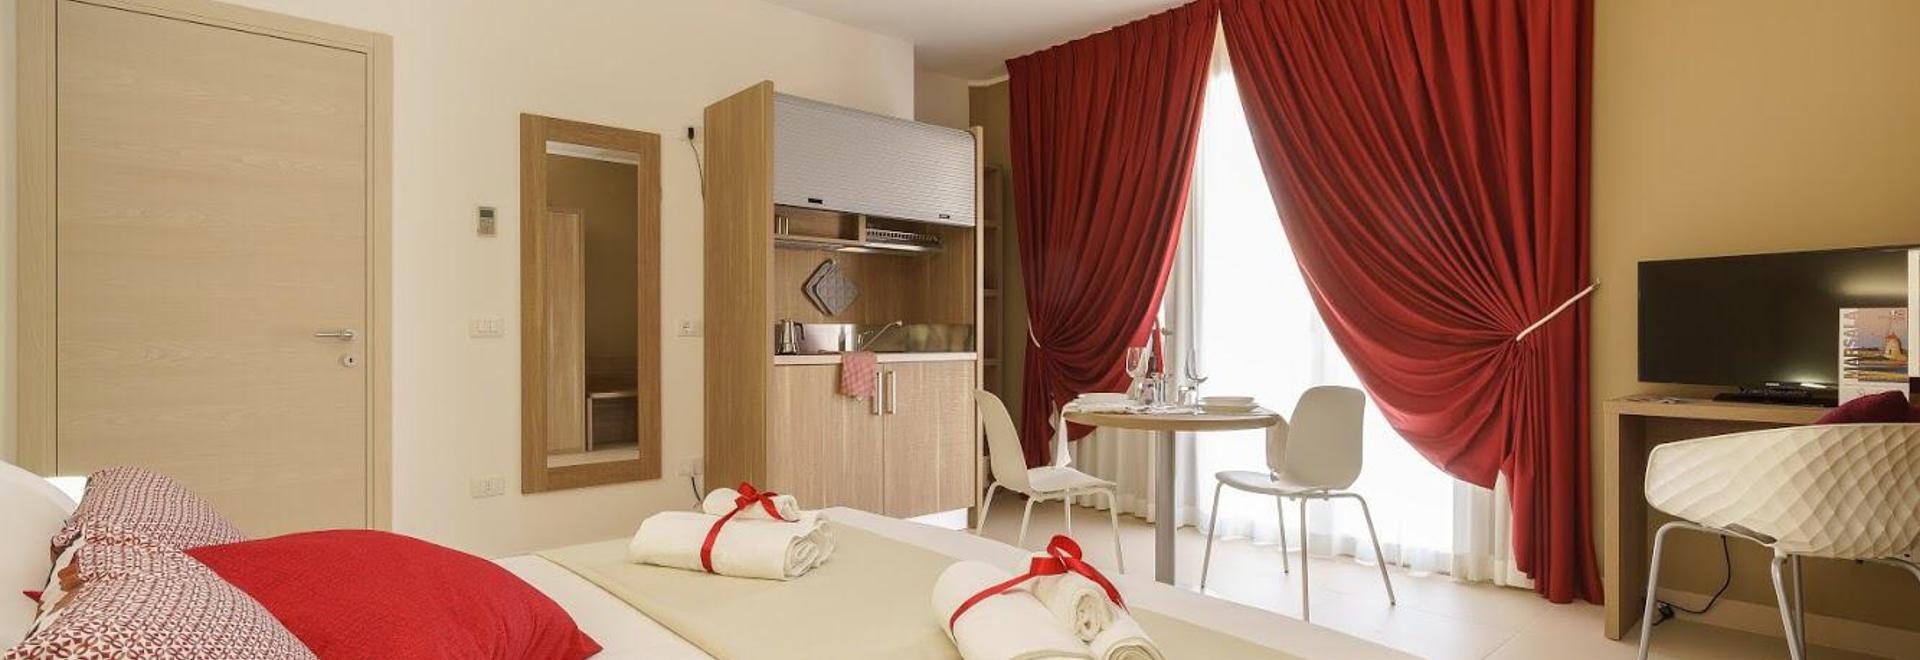 Hotel Residence Gad